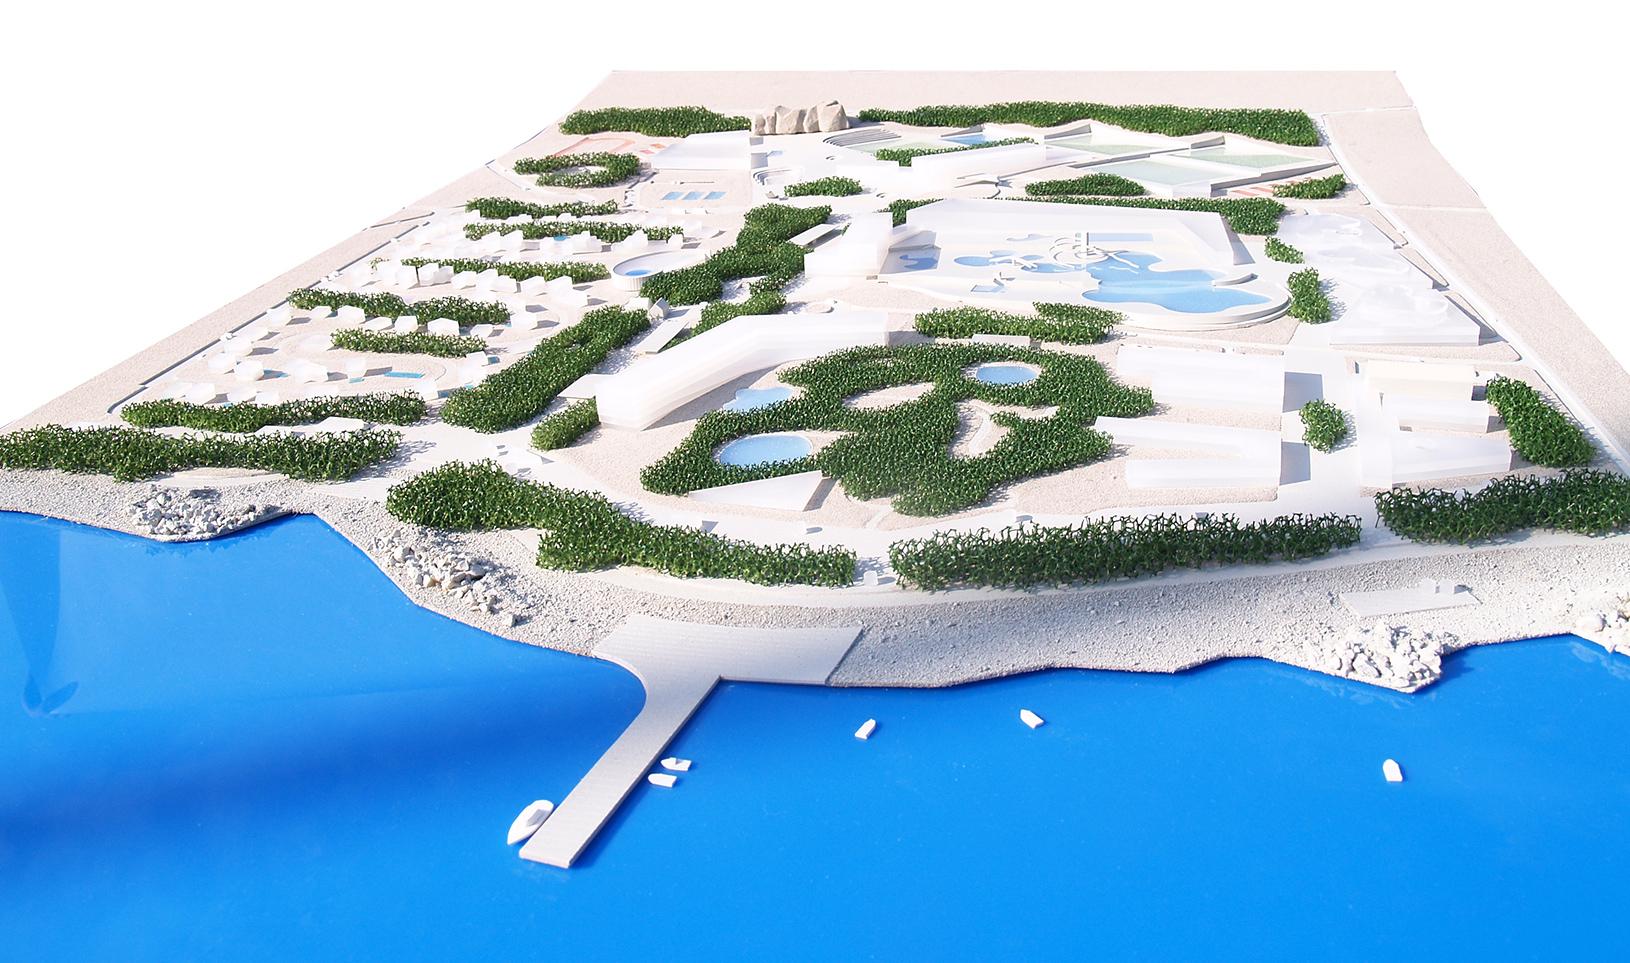 baško polje, upi-2m, polje, baška, krk, hrvatska, croatia, arhitektura, architecture, urban planning, urbanizam